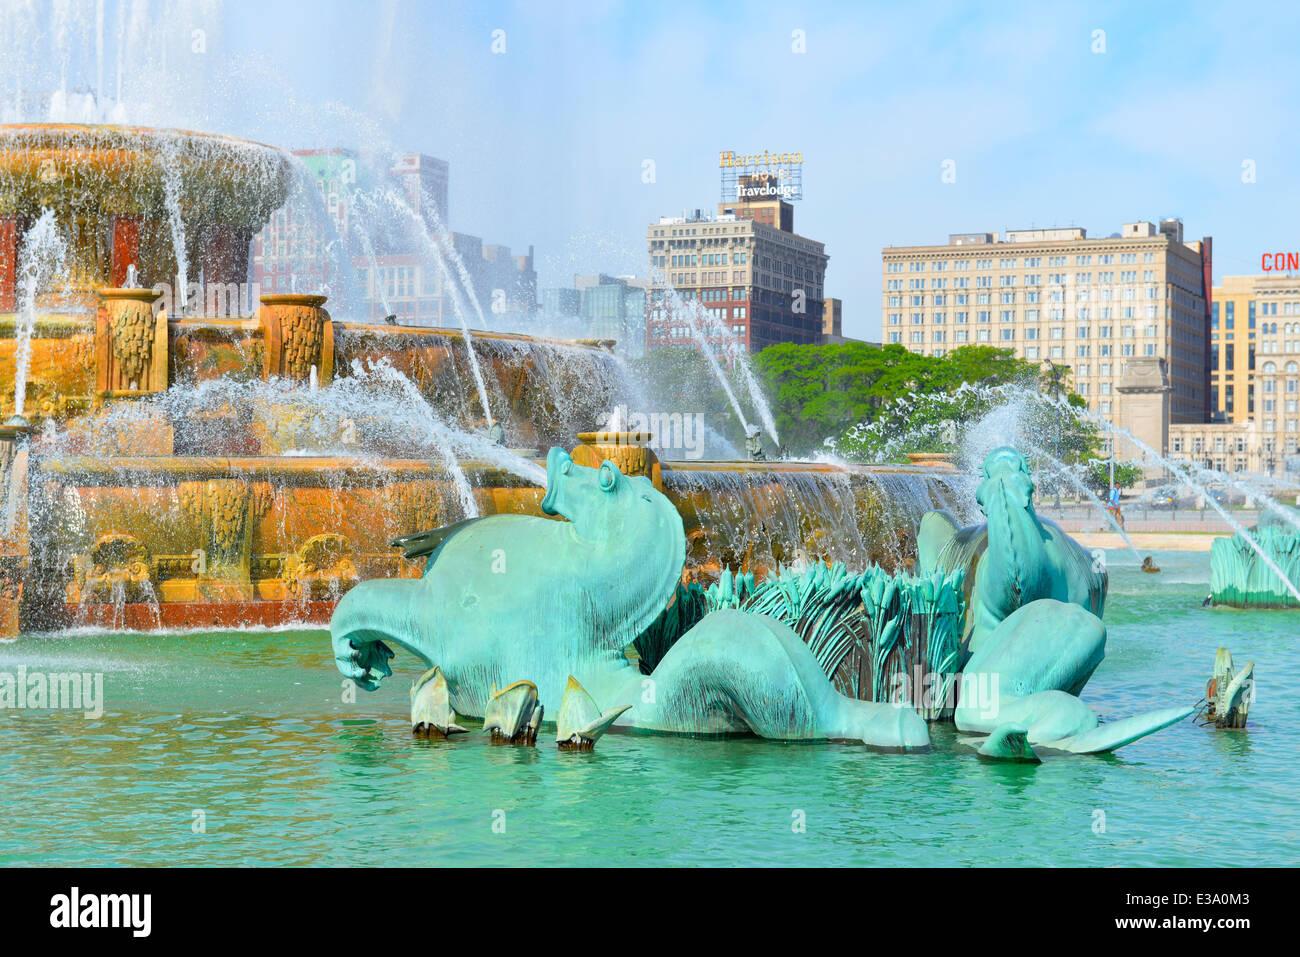 Buckingham Fountain, Fountains, Grant Park, Chicago, Illinois - Stock Image